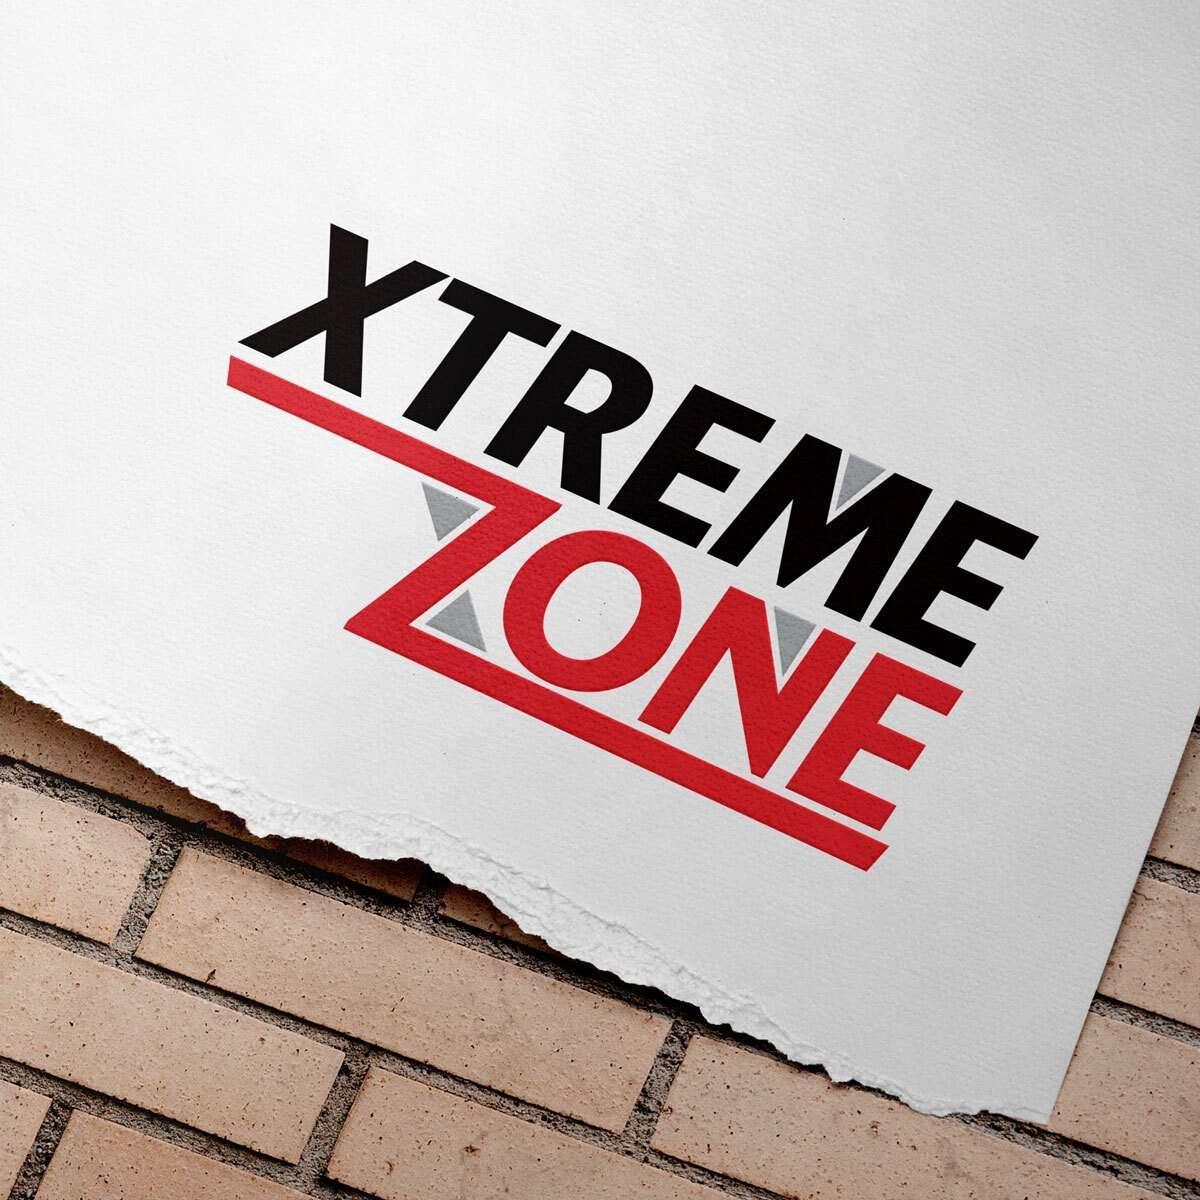 Xtreme Zone Logo Design by BrandSwan, a logo design company